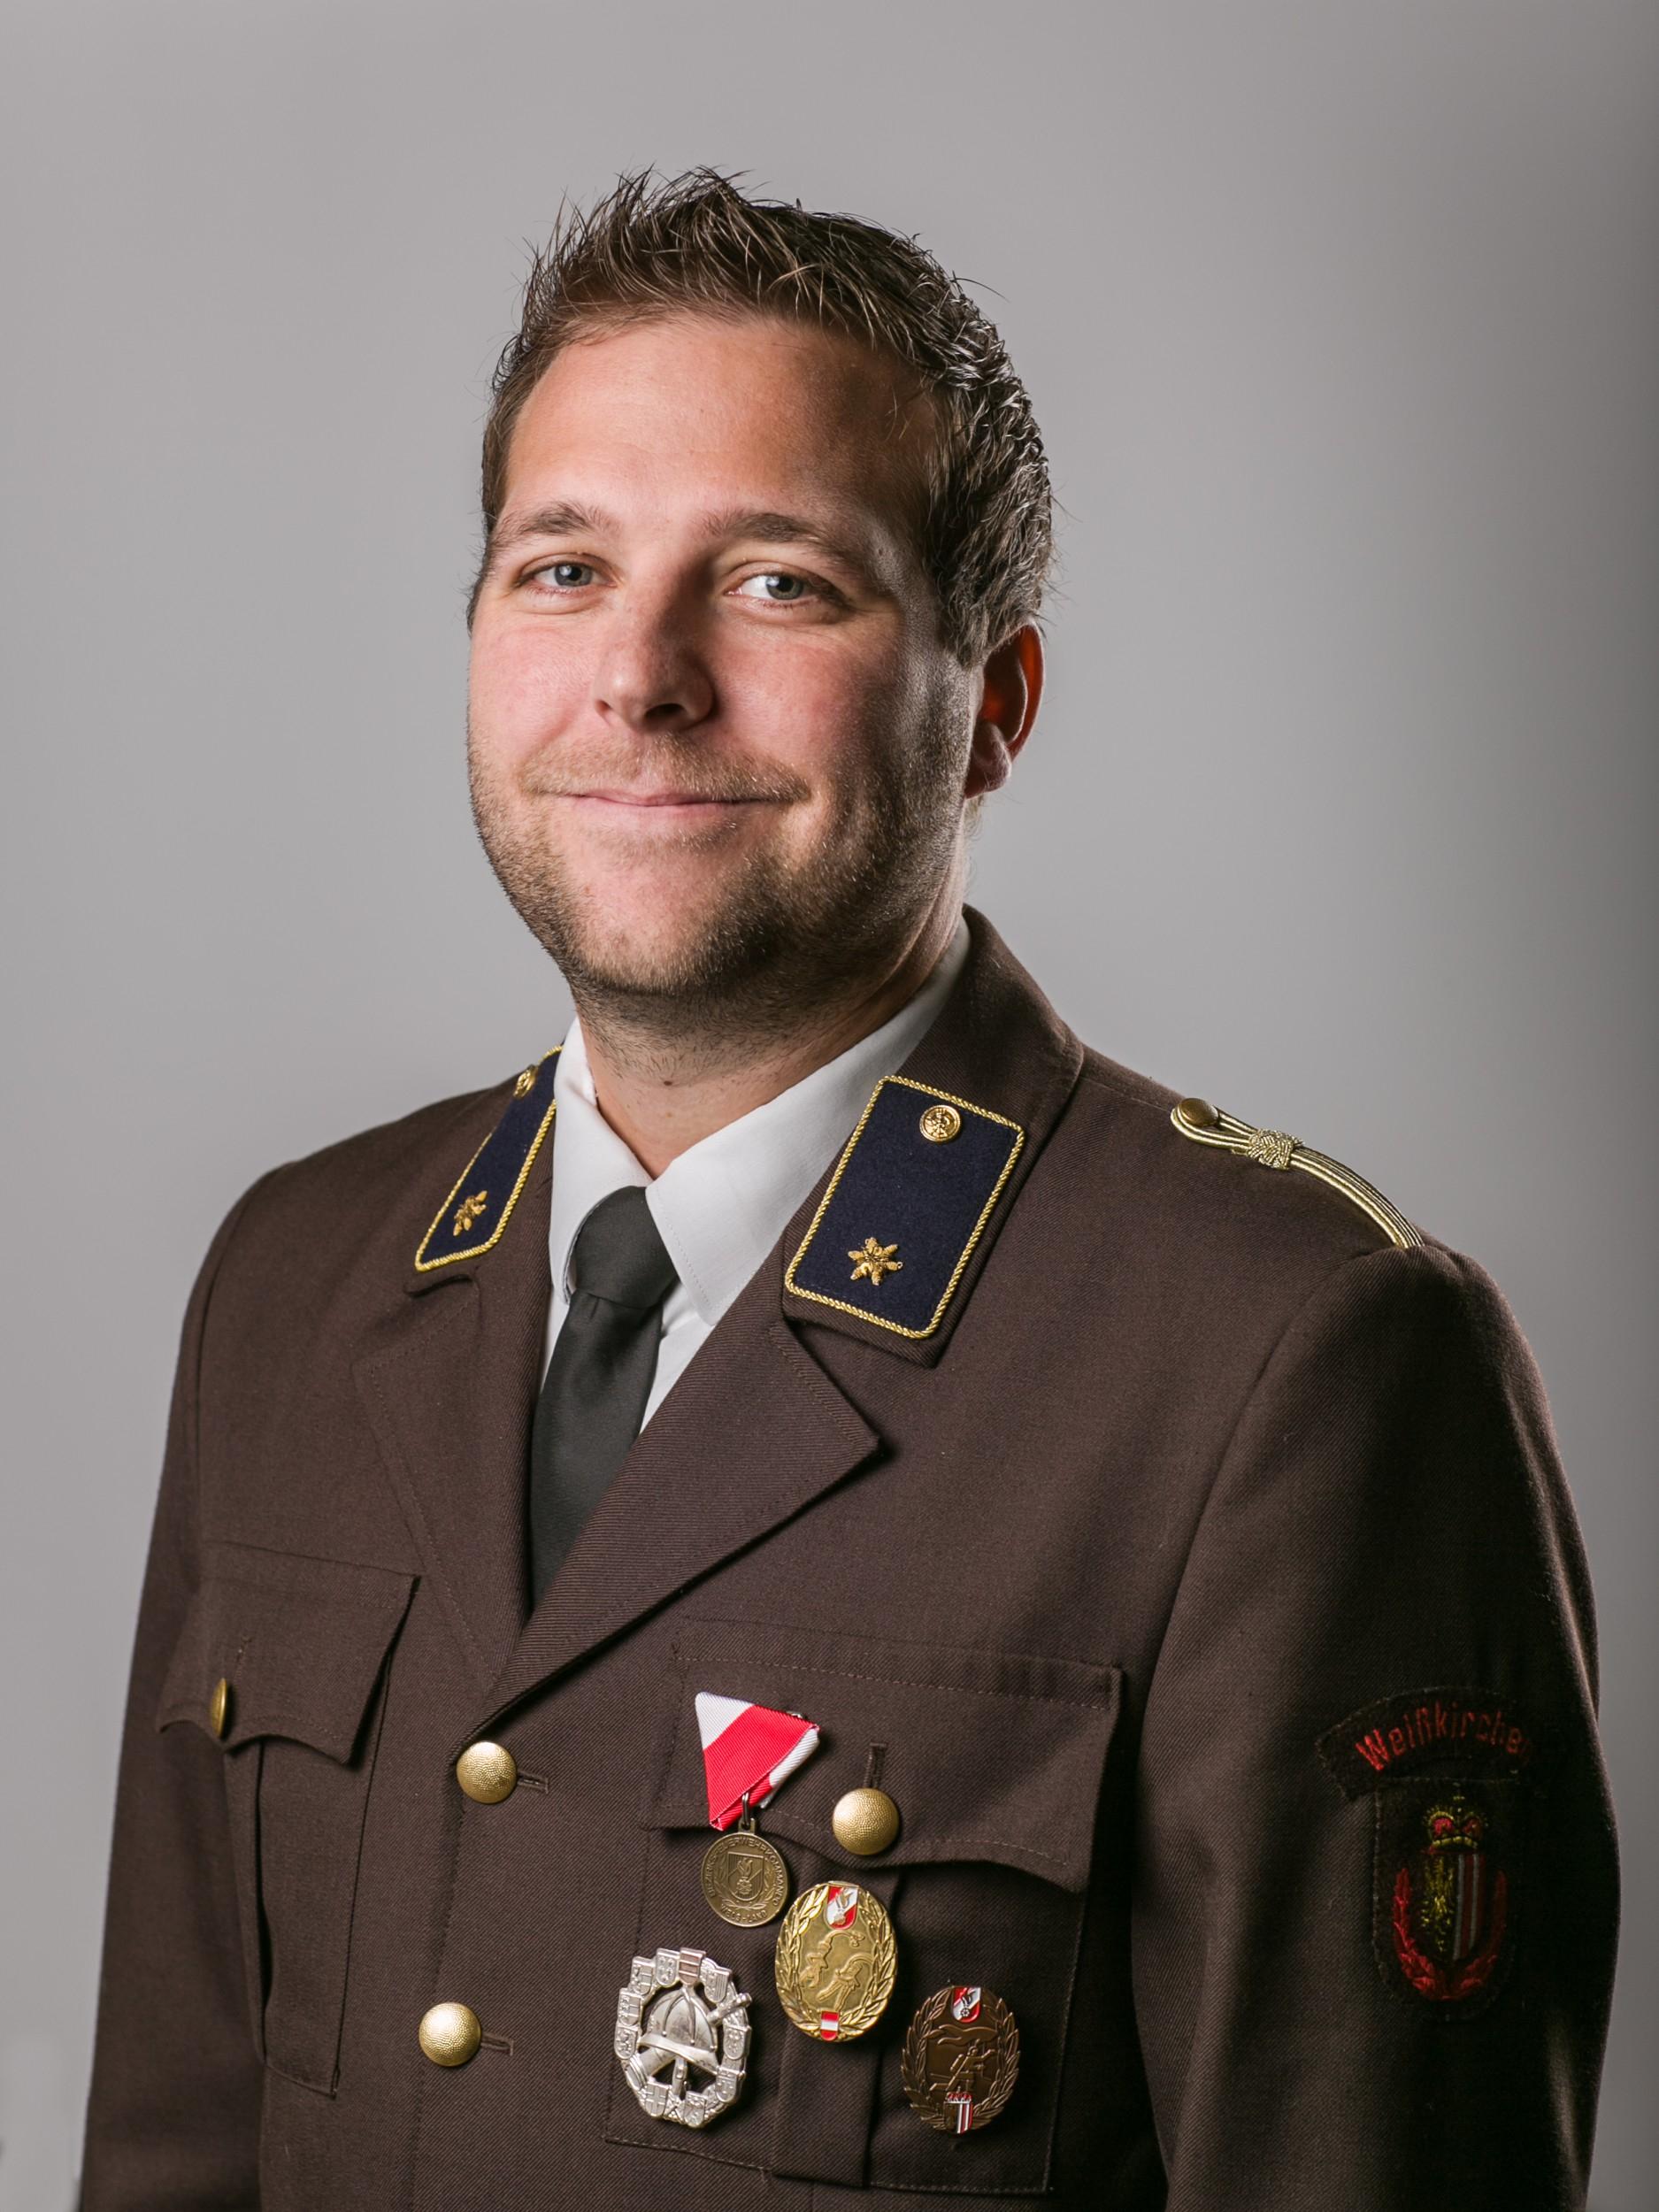 Michael Neulinger